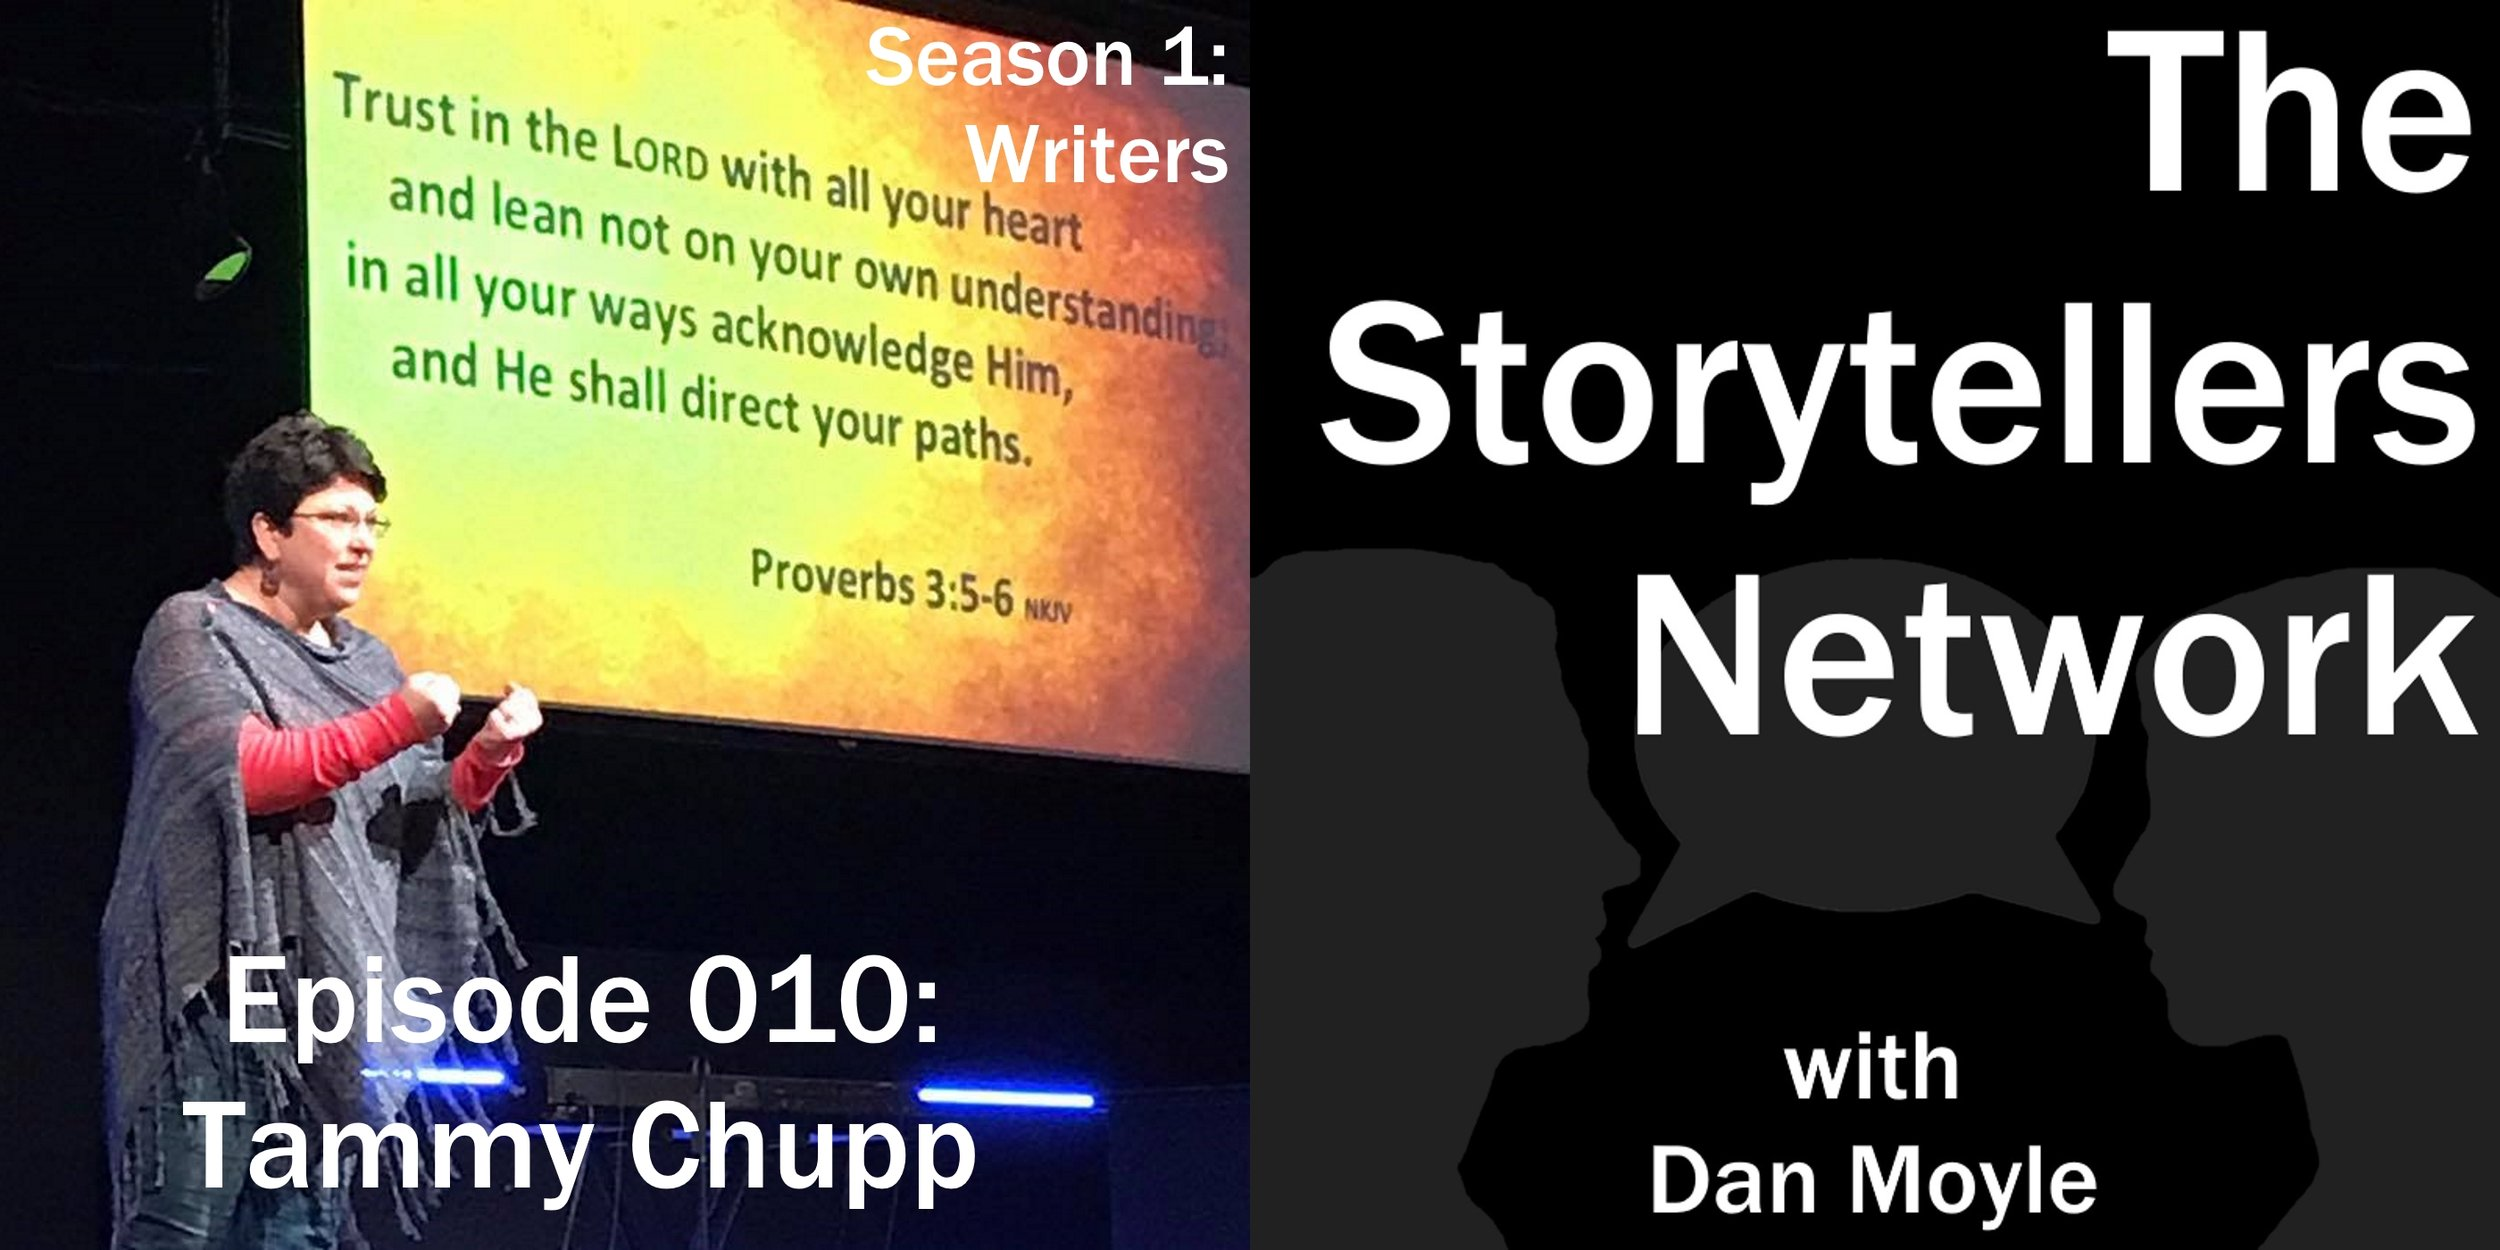 Episode 010 Art - Tammy Chupp.jpg